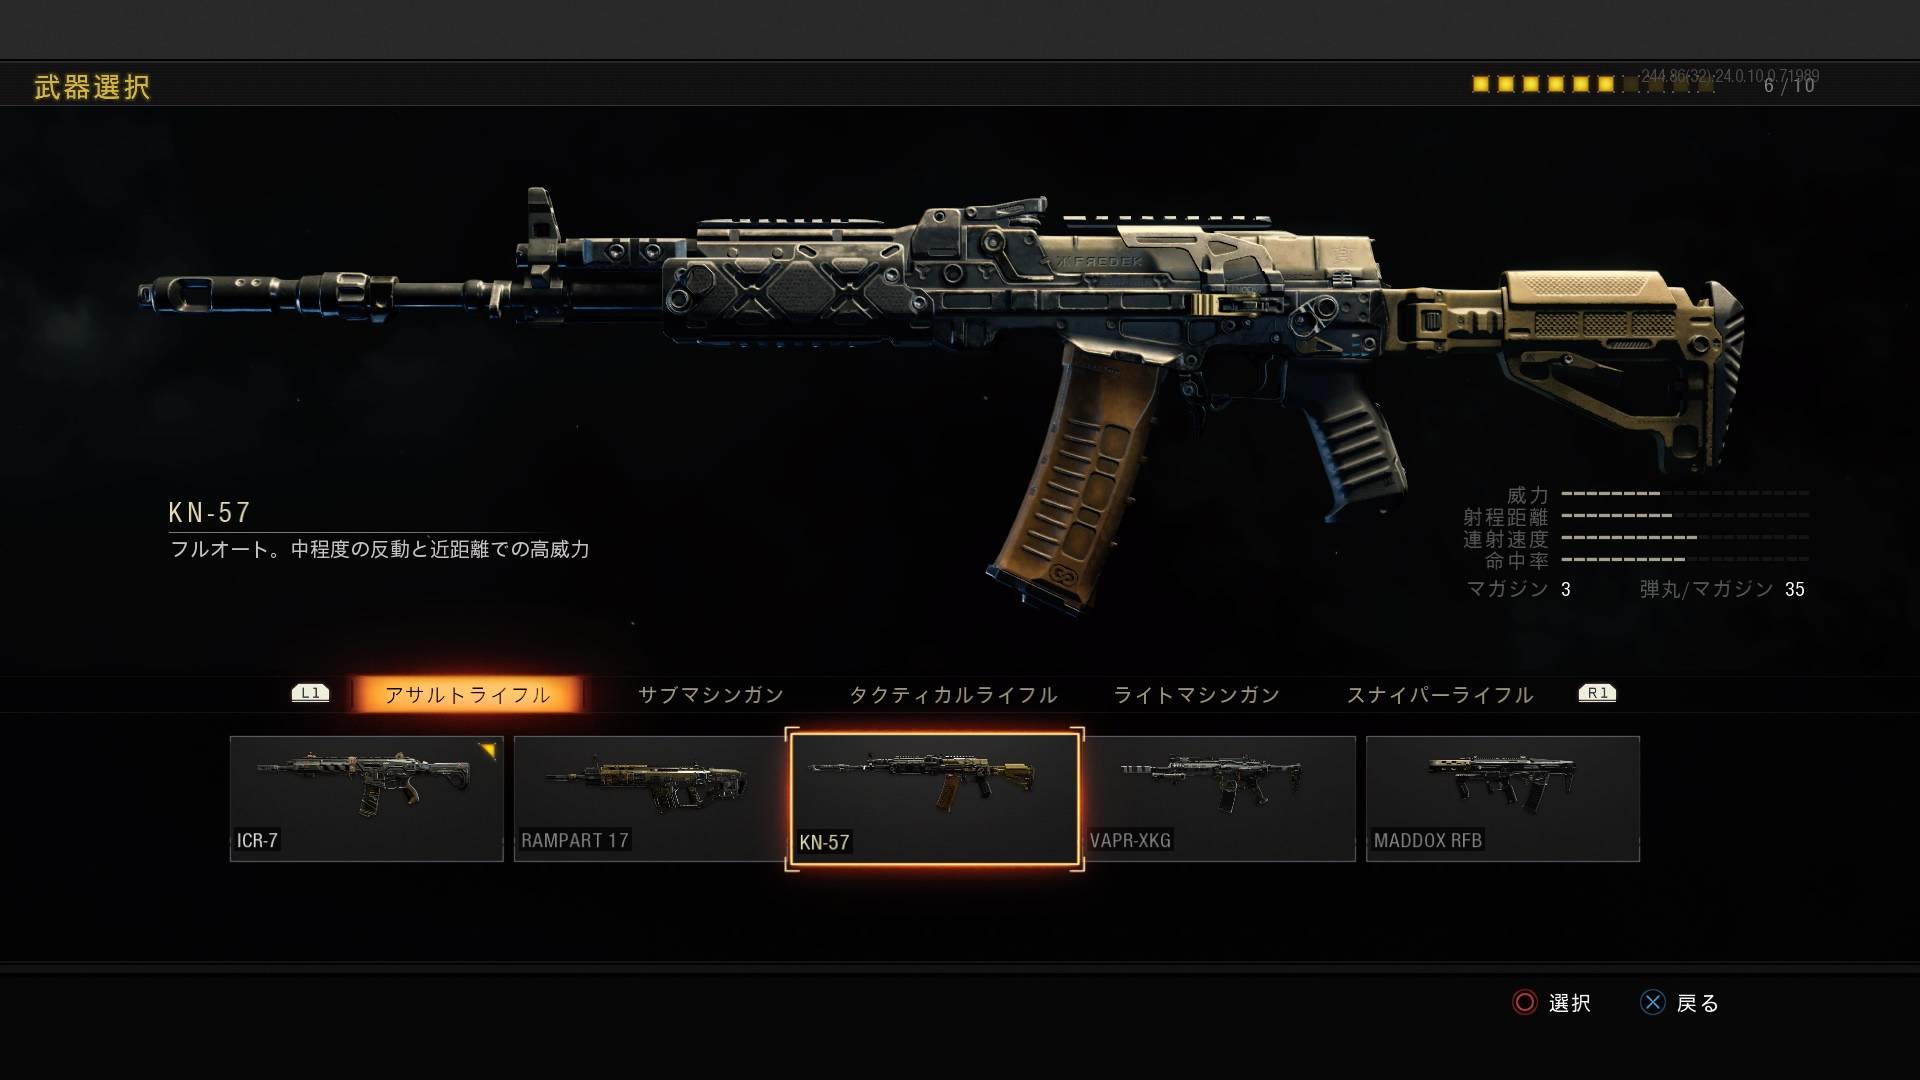 KN-57